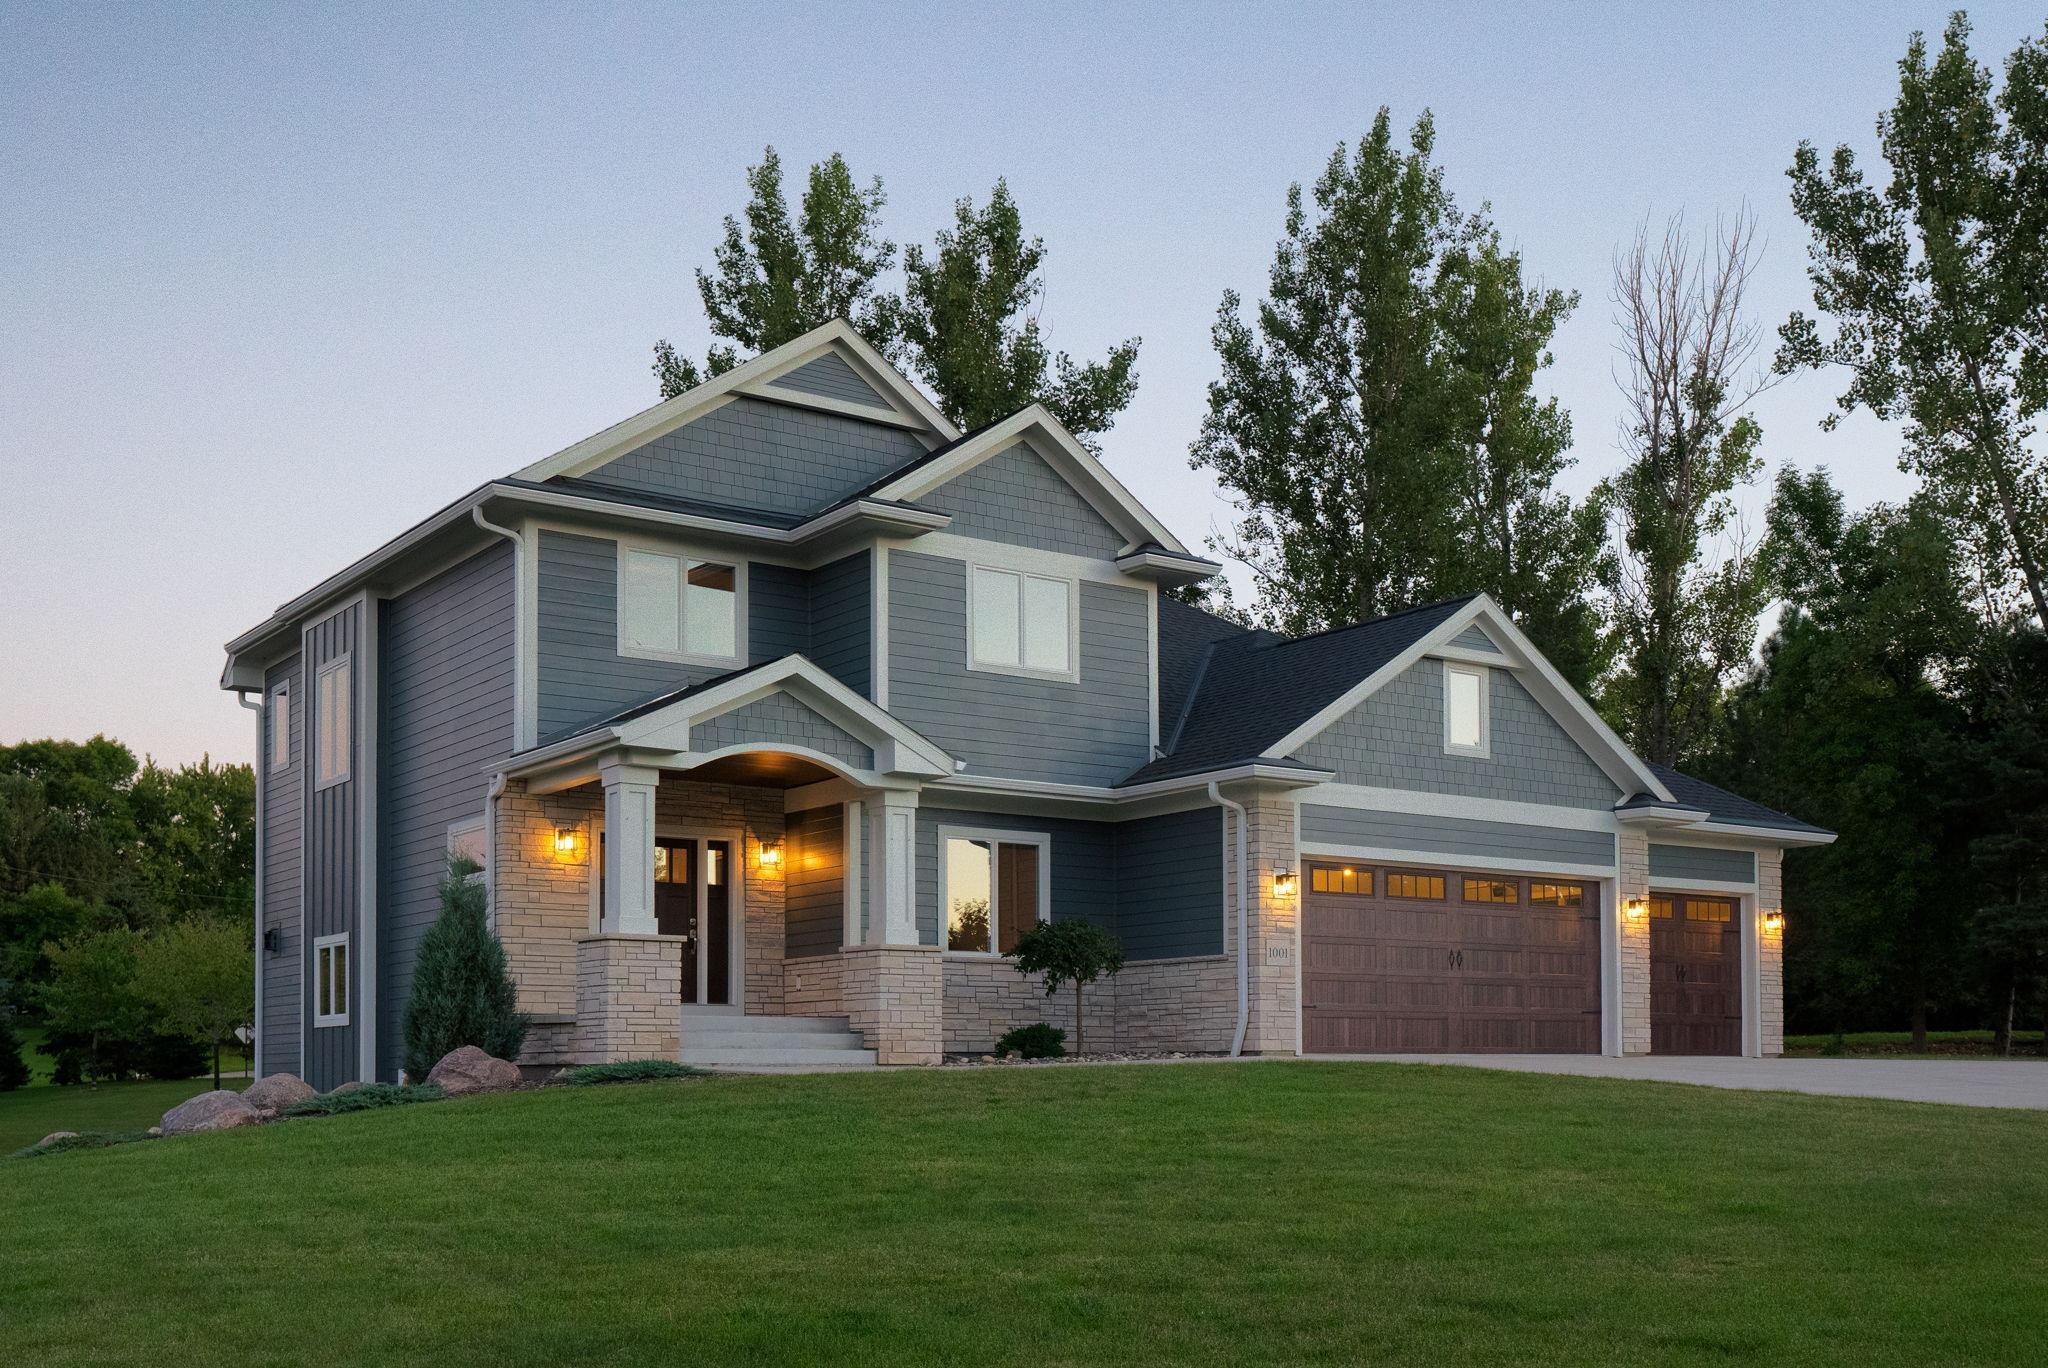 1001 Applewood Court Property Photo - Mankato, MN real estate listing